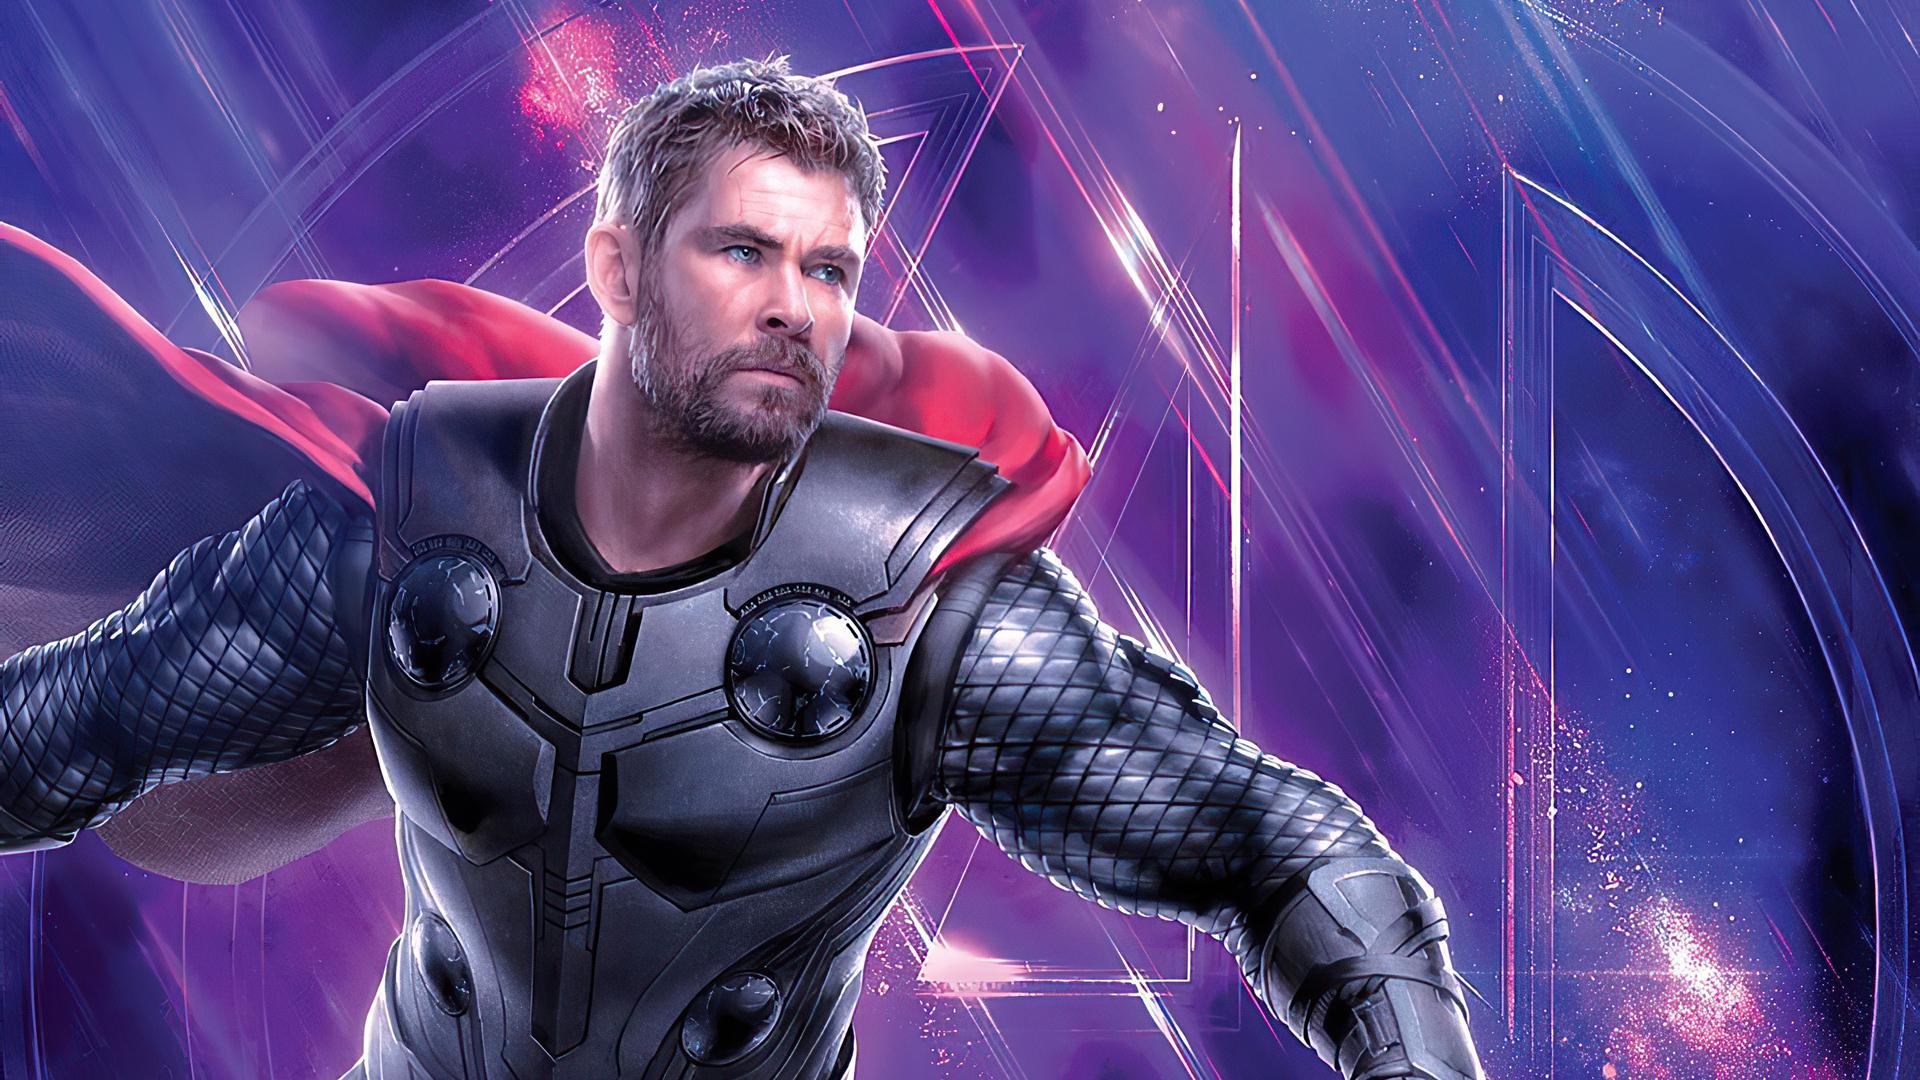 1920x1080 Thor Avengers 4k Laptop Full HD 1080P HD 4k ...